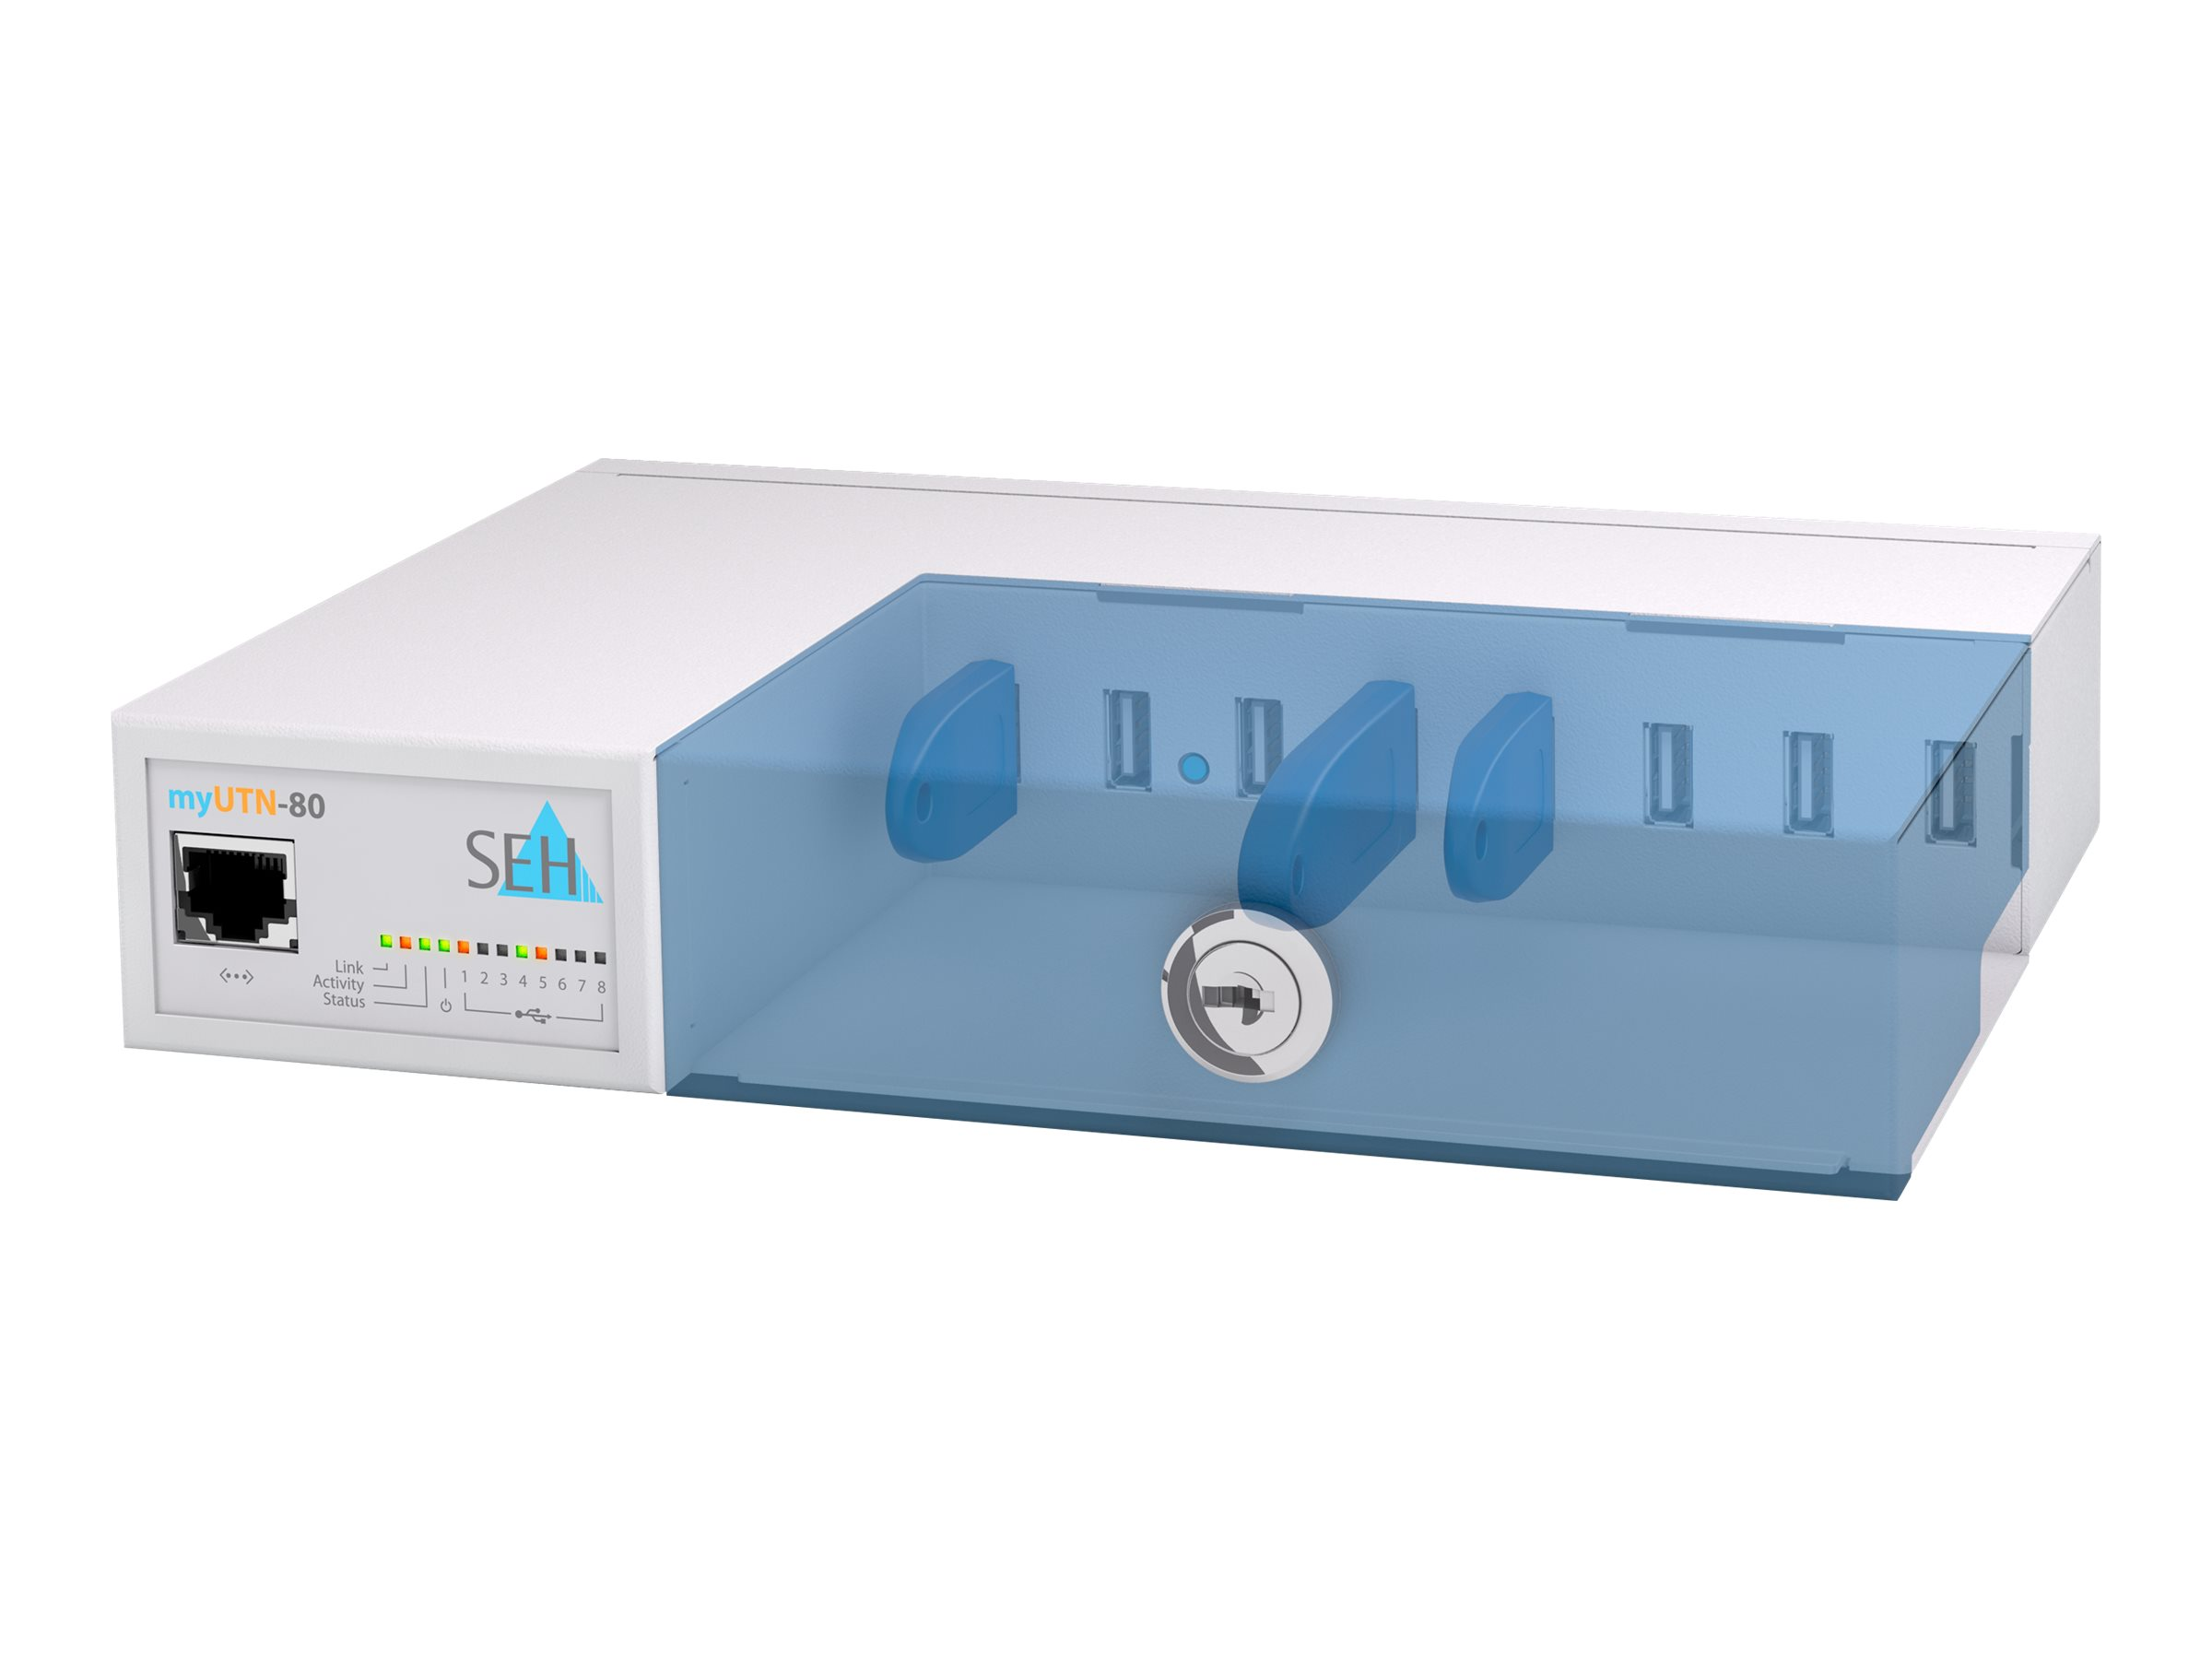 SEH myUTN-80 - Geräteserver - 100Mb LAN, USB 2.0